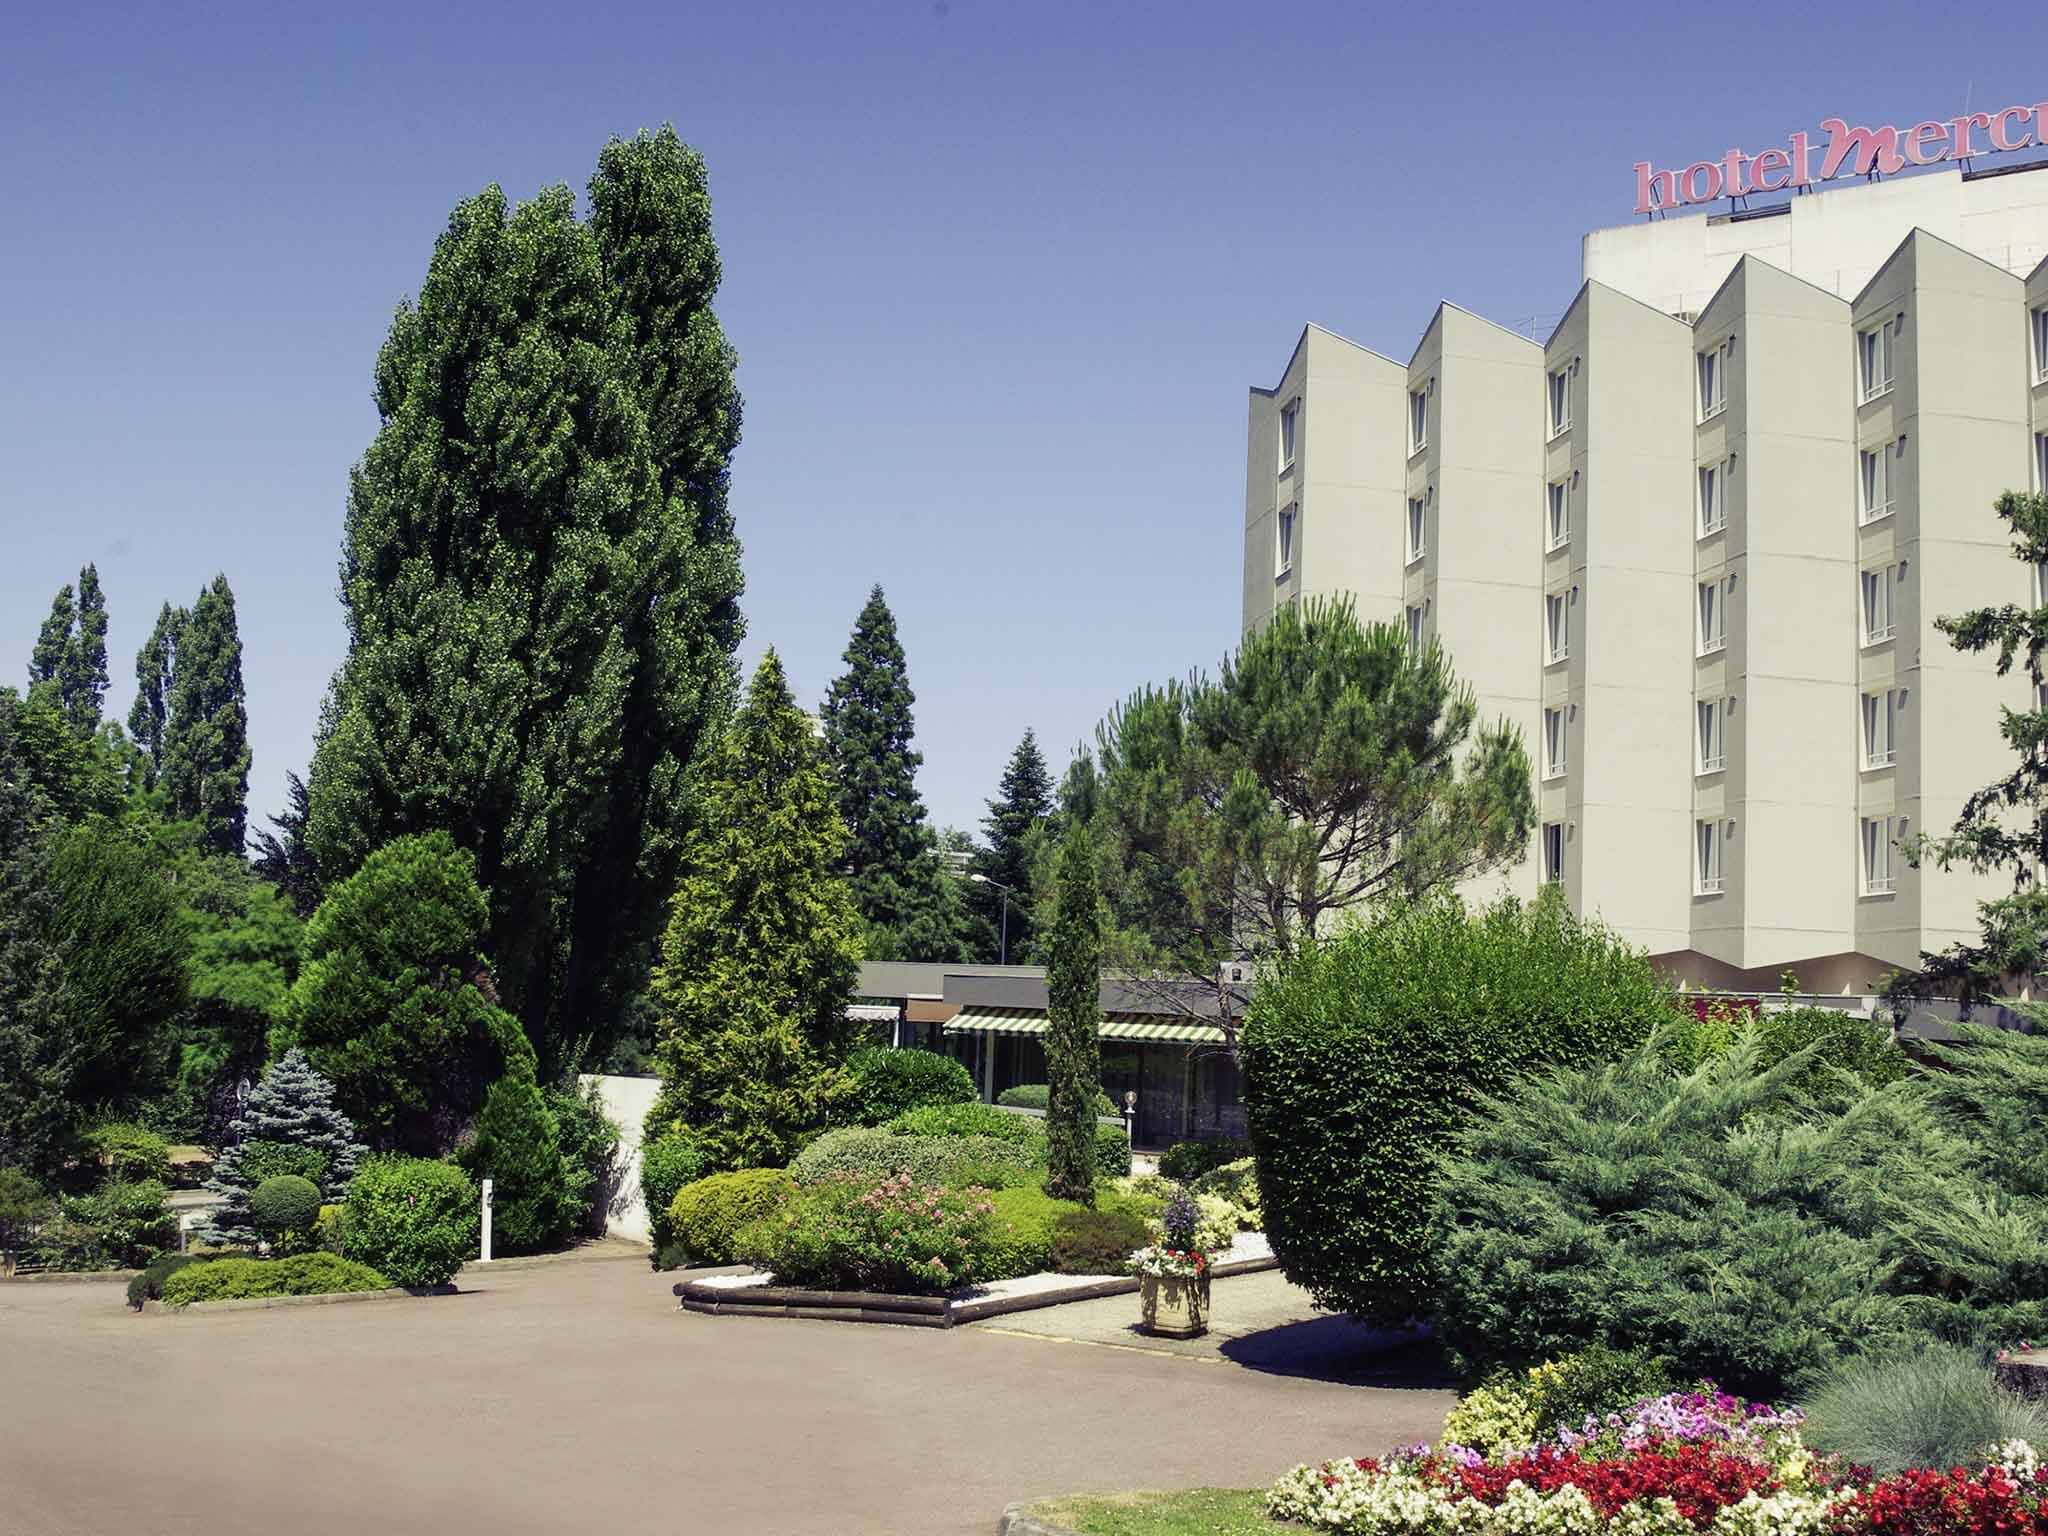 ホテル – Hôtel Mercure Saint-Étienne Parc de l'Europe